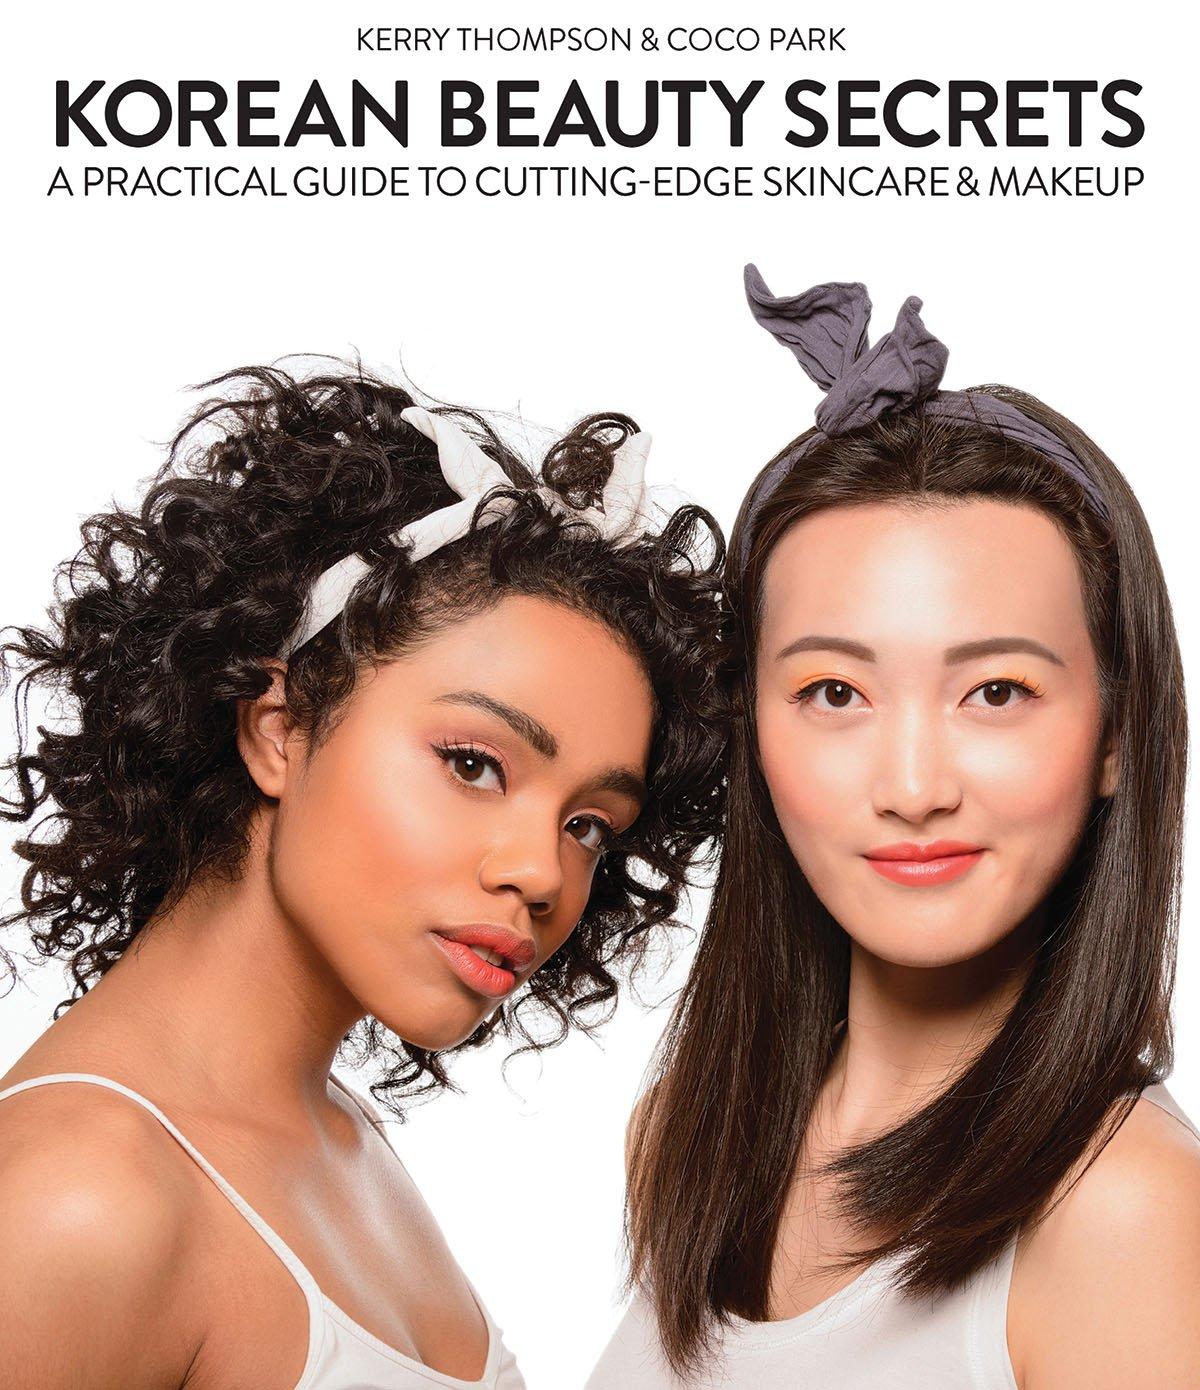 Korean Beauty Secrets: A Practical Guide to